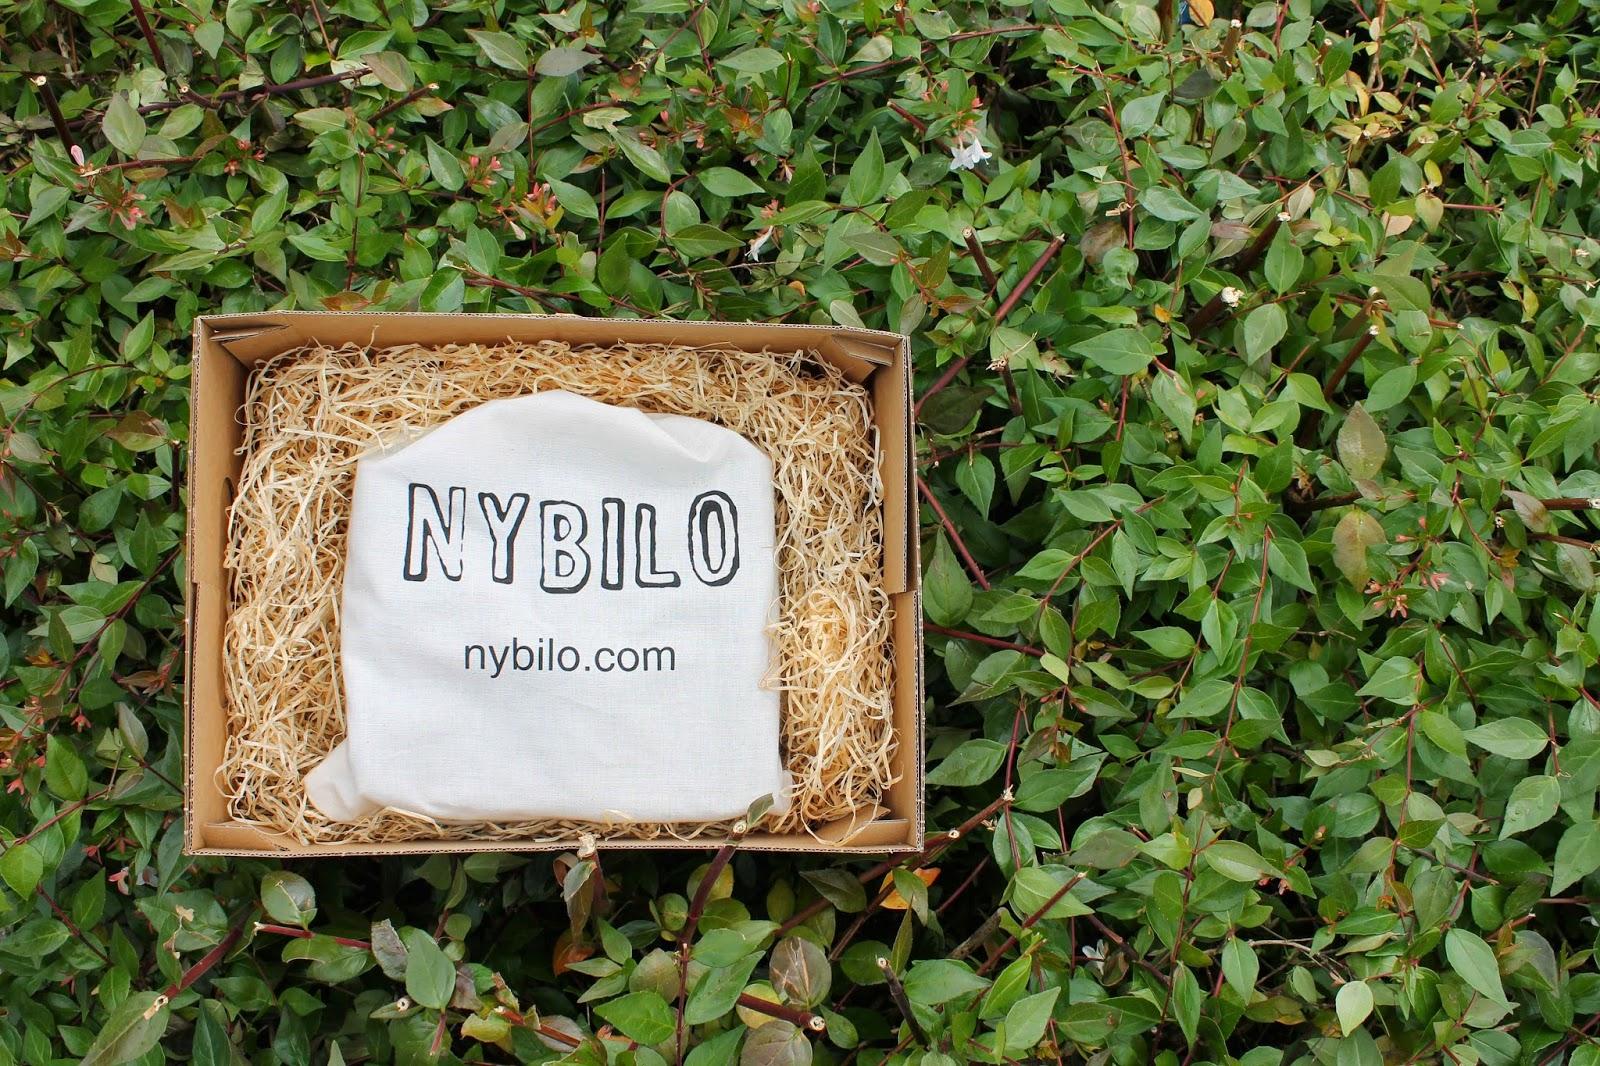 Nybilo shop